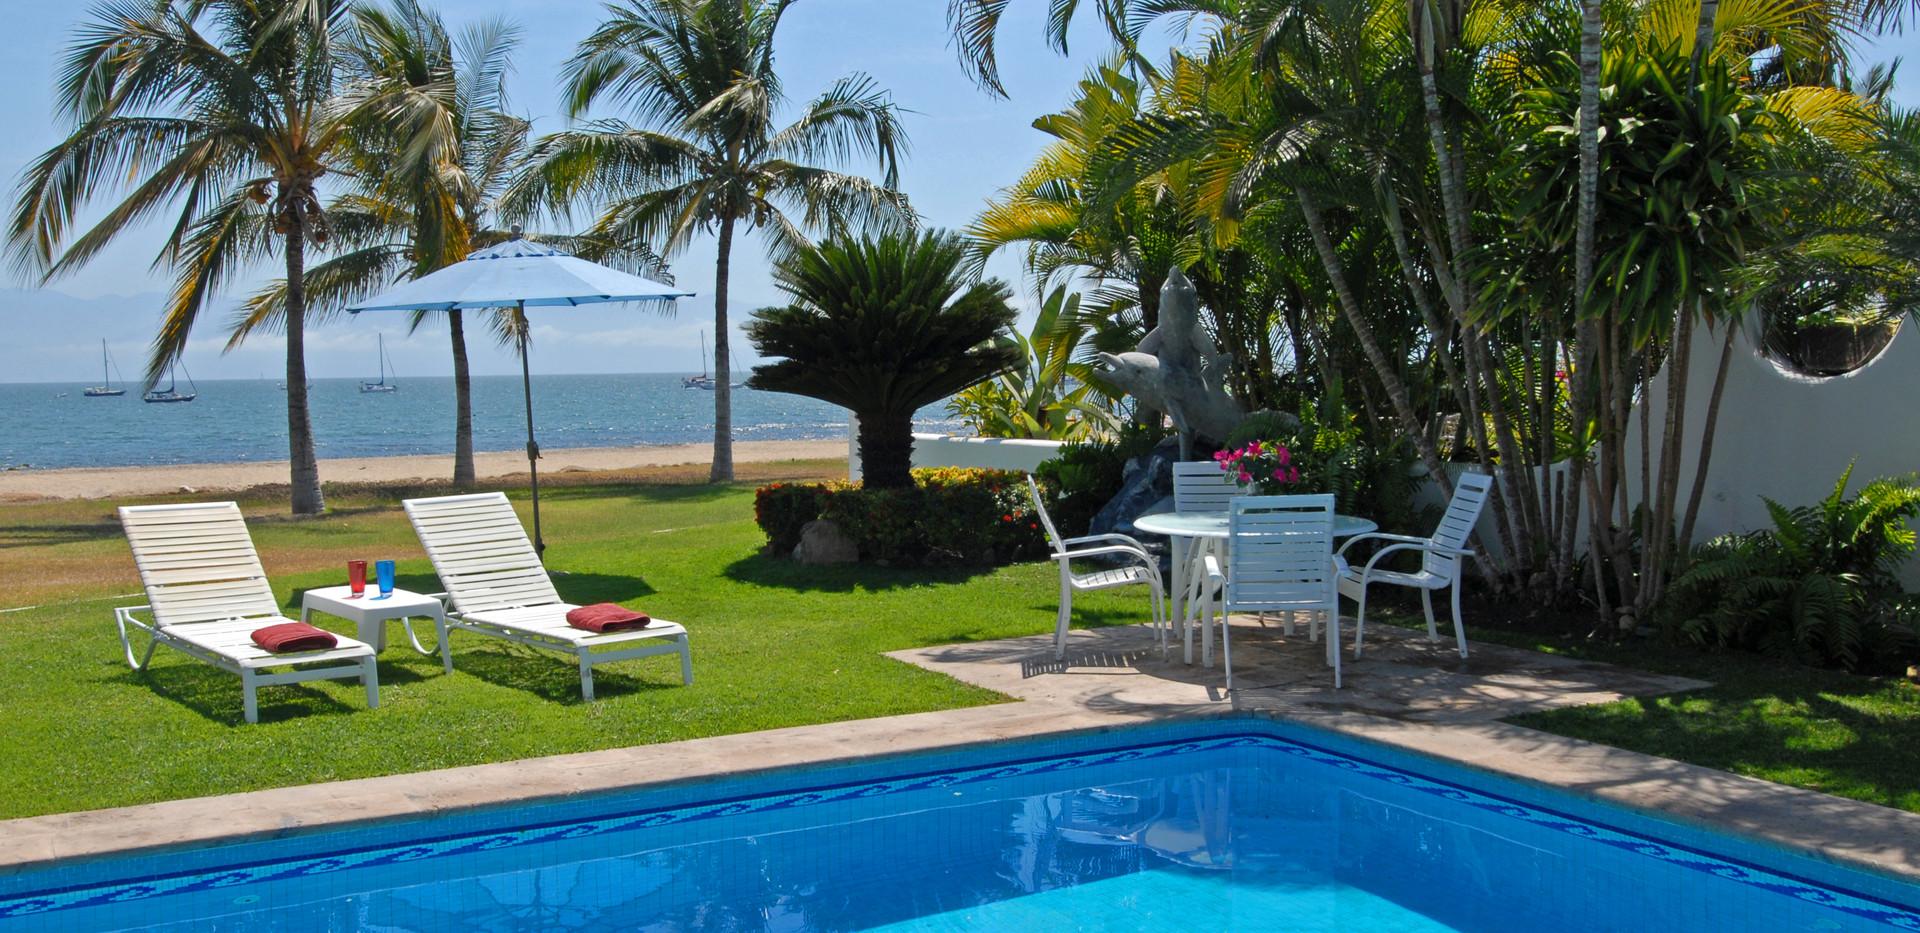 Poolside Lounge Areas